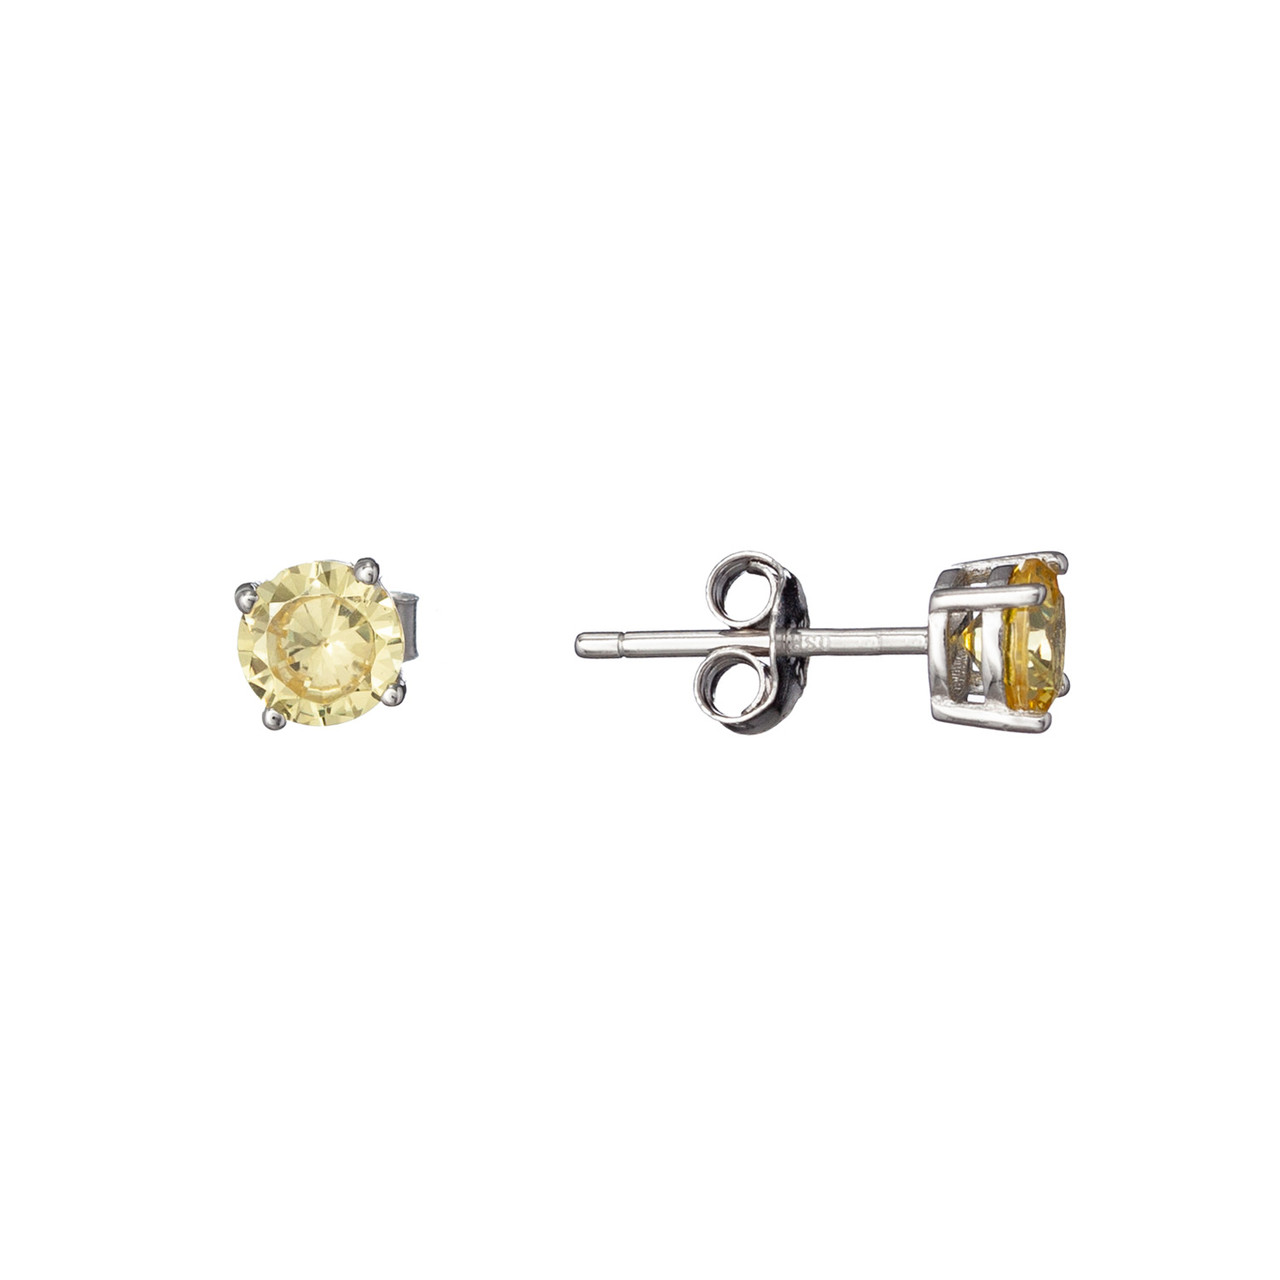 Серебряные Серьги-пусеты Brosh Jewellery. Серебро 925 пробы